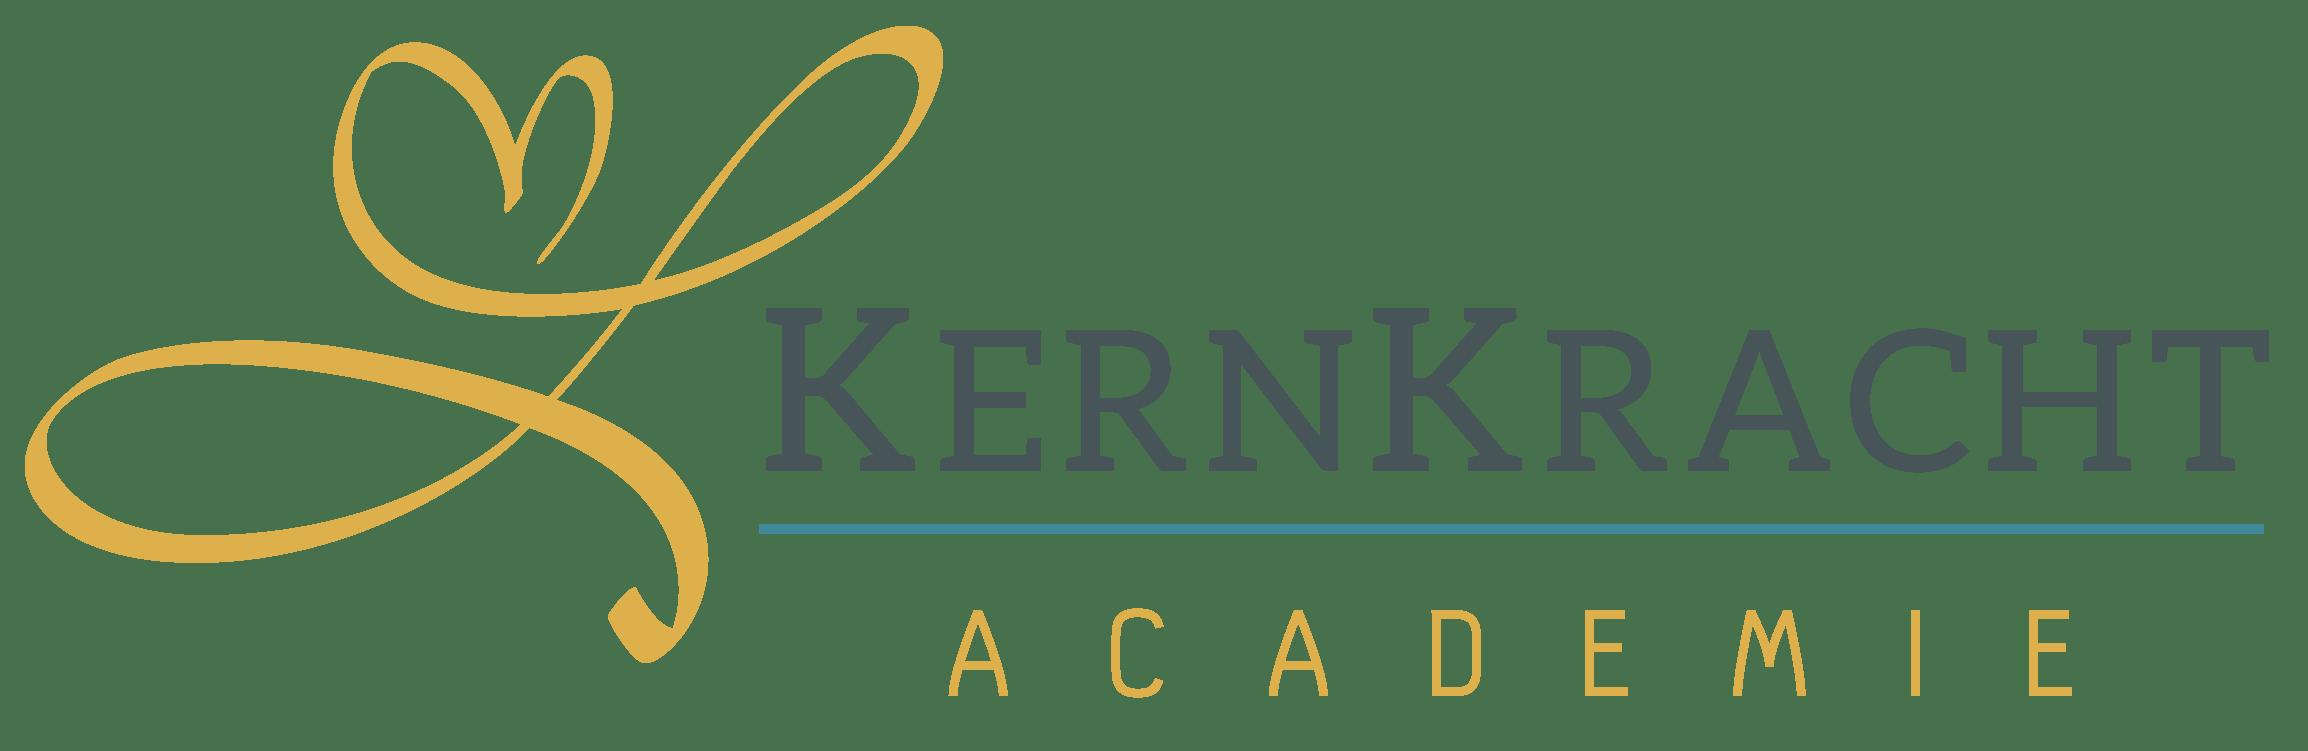 Kernkracht Academie